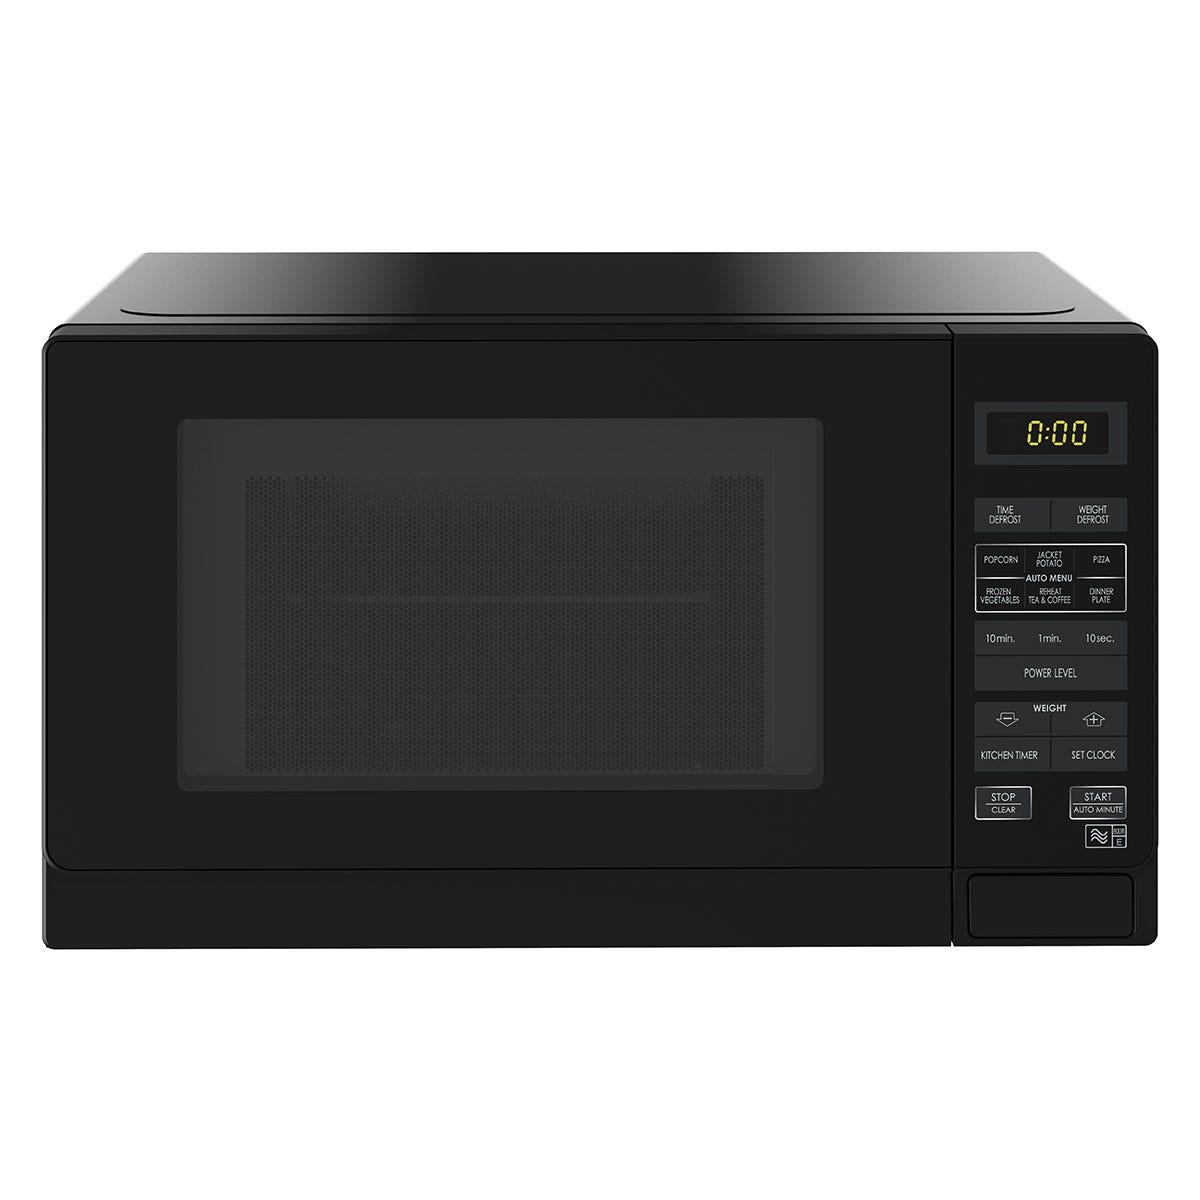 Sharp R272KM 20L 800W Solo Microwave - Black